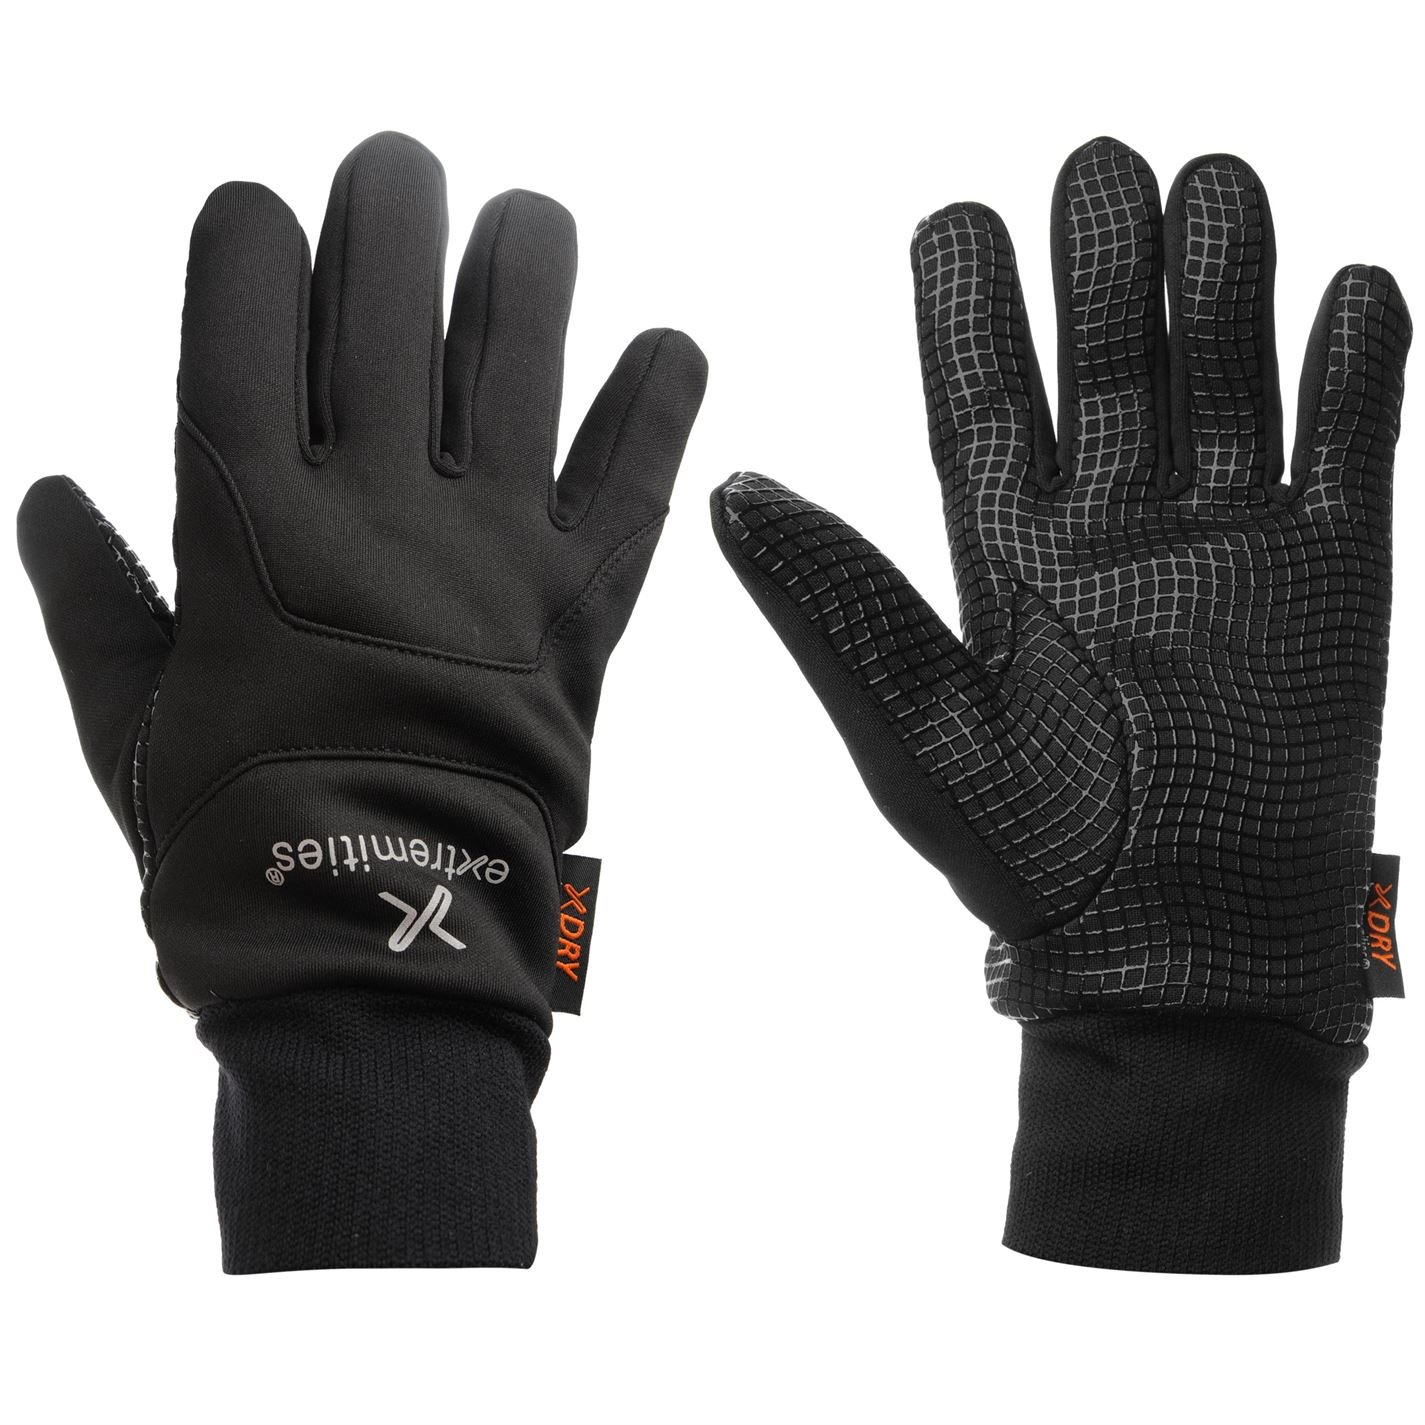 Handschuhe Neu Extremities Wasserdichter Sticky Power Liner Handschuh Schwarz Camping & Outdoor